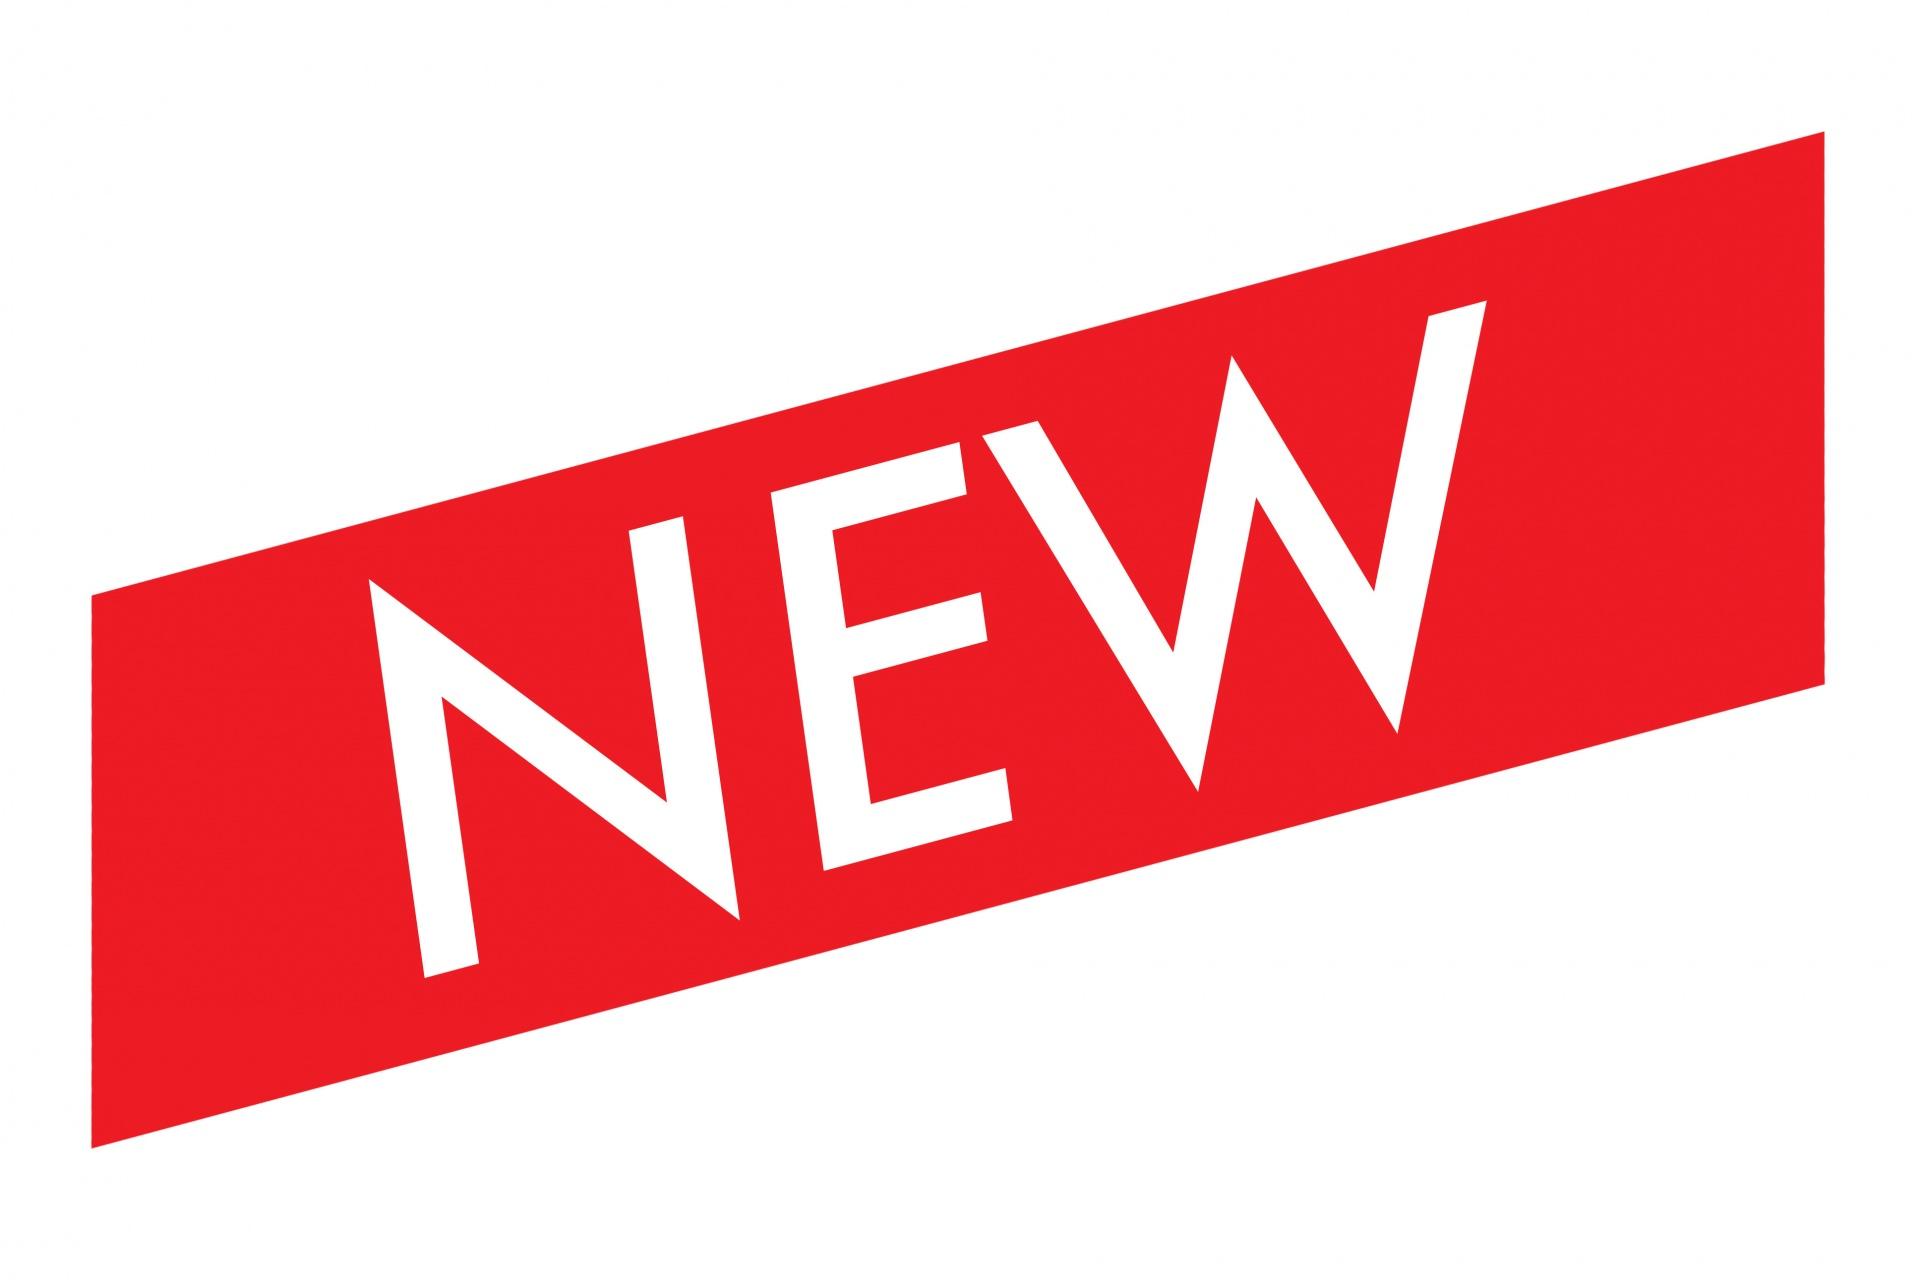 New-label-overlay.jpg